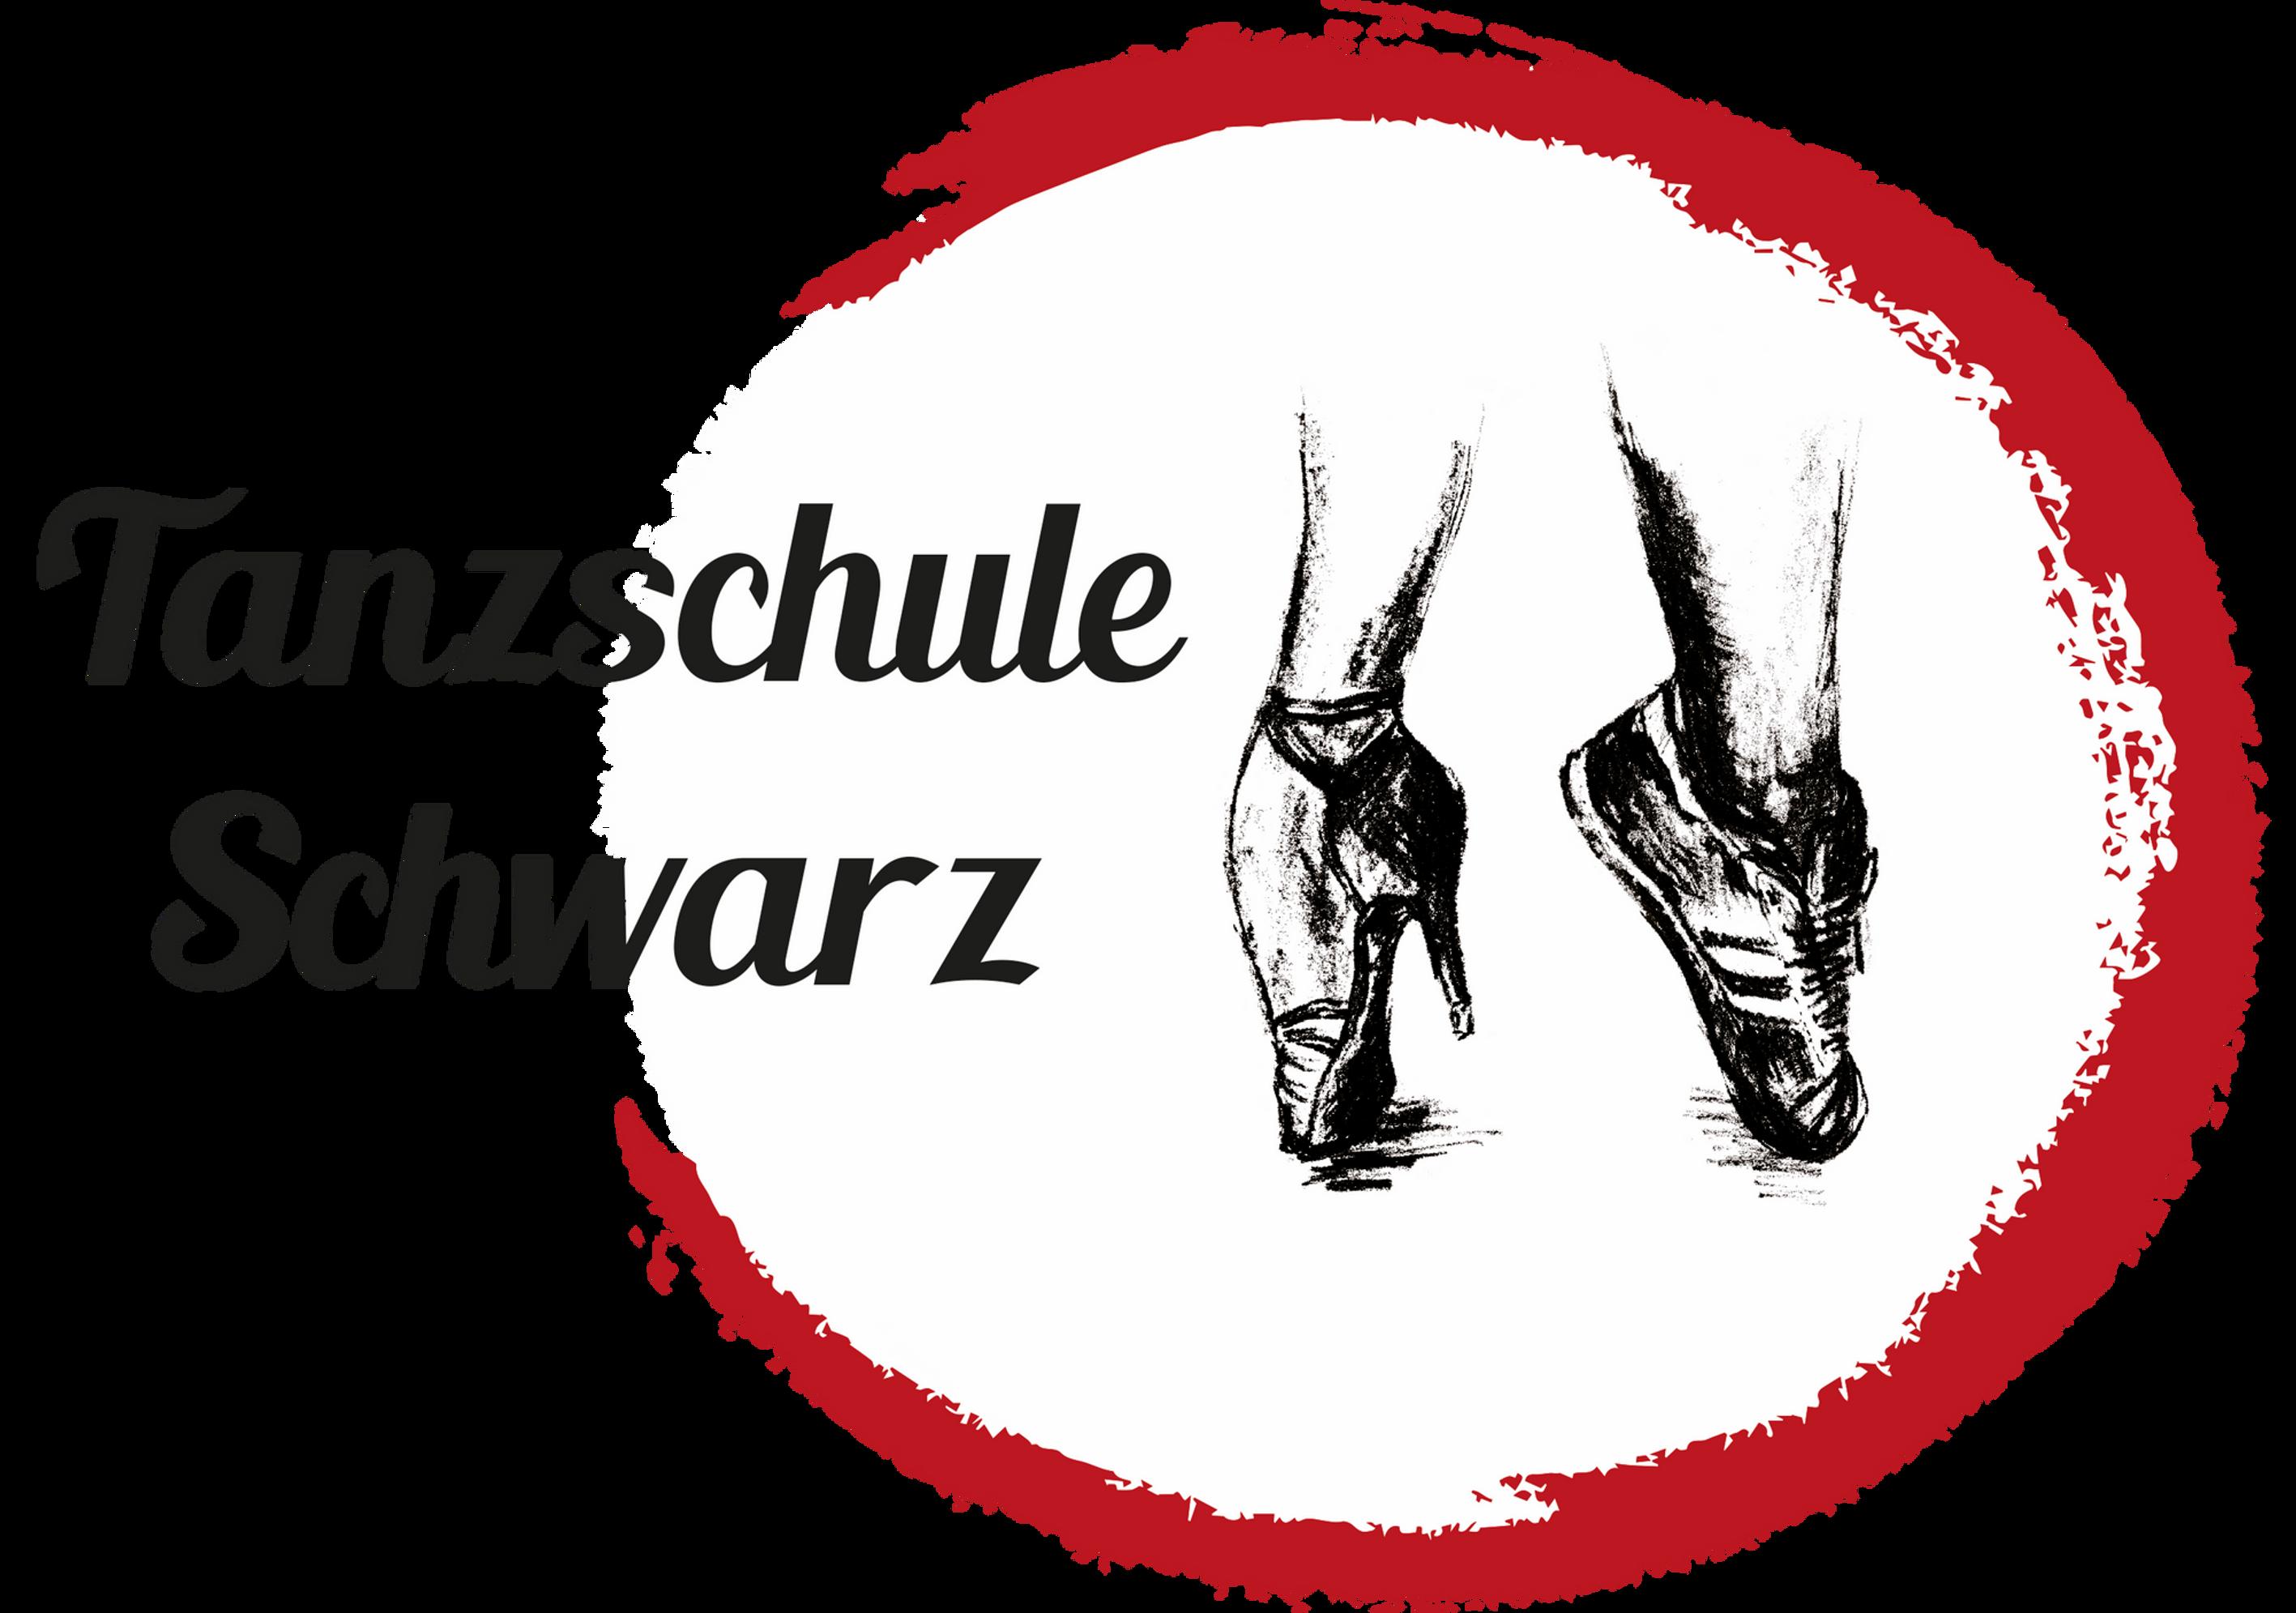 Tanzschule fur singles augsburg